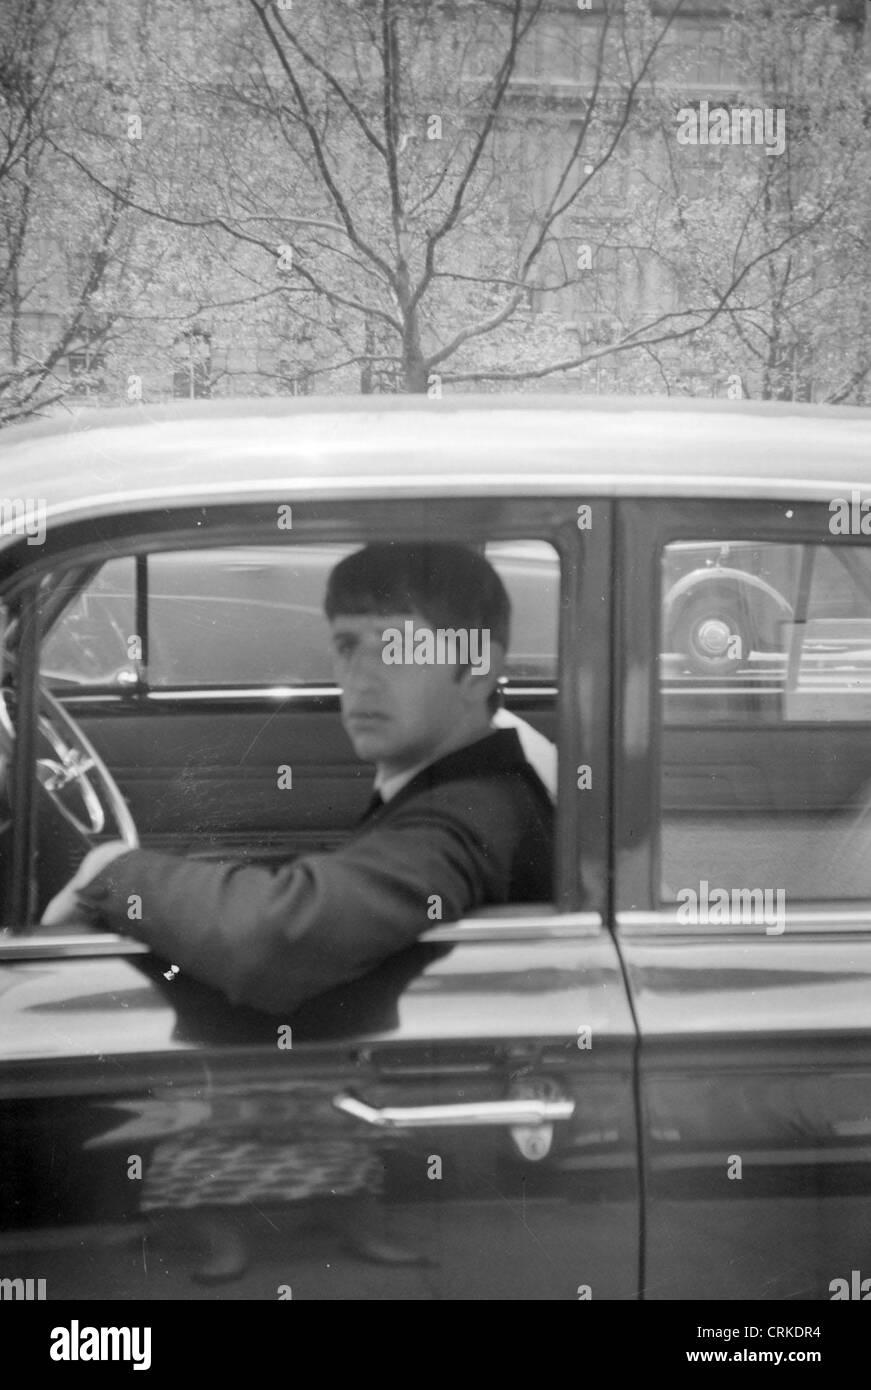 003141 - Ringo Starr in Sloane Square, Chelsea, London on 10th February 1963 - Stock Image